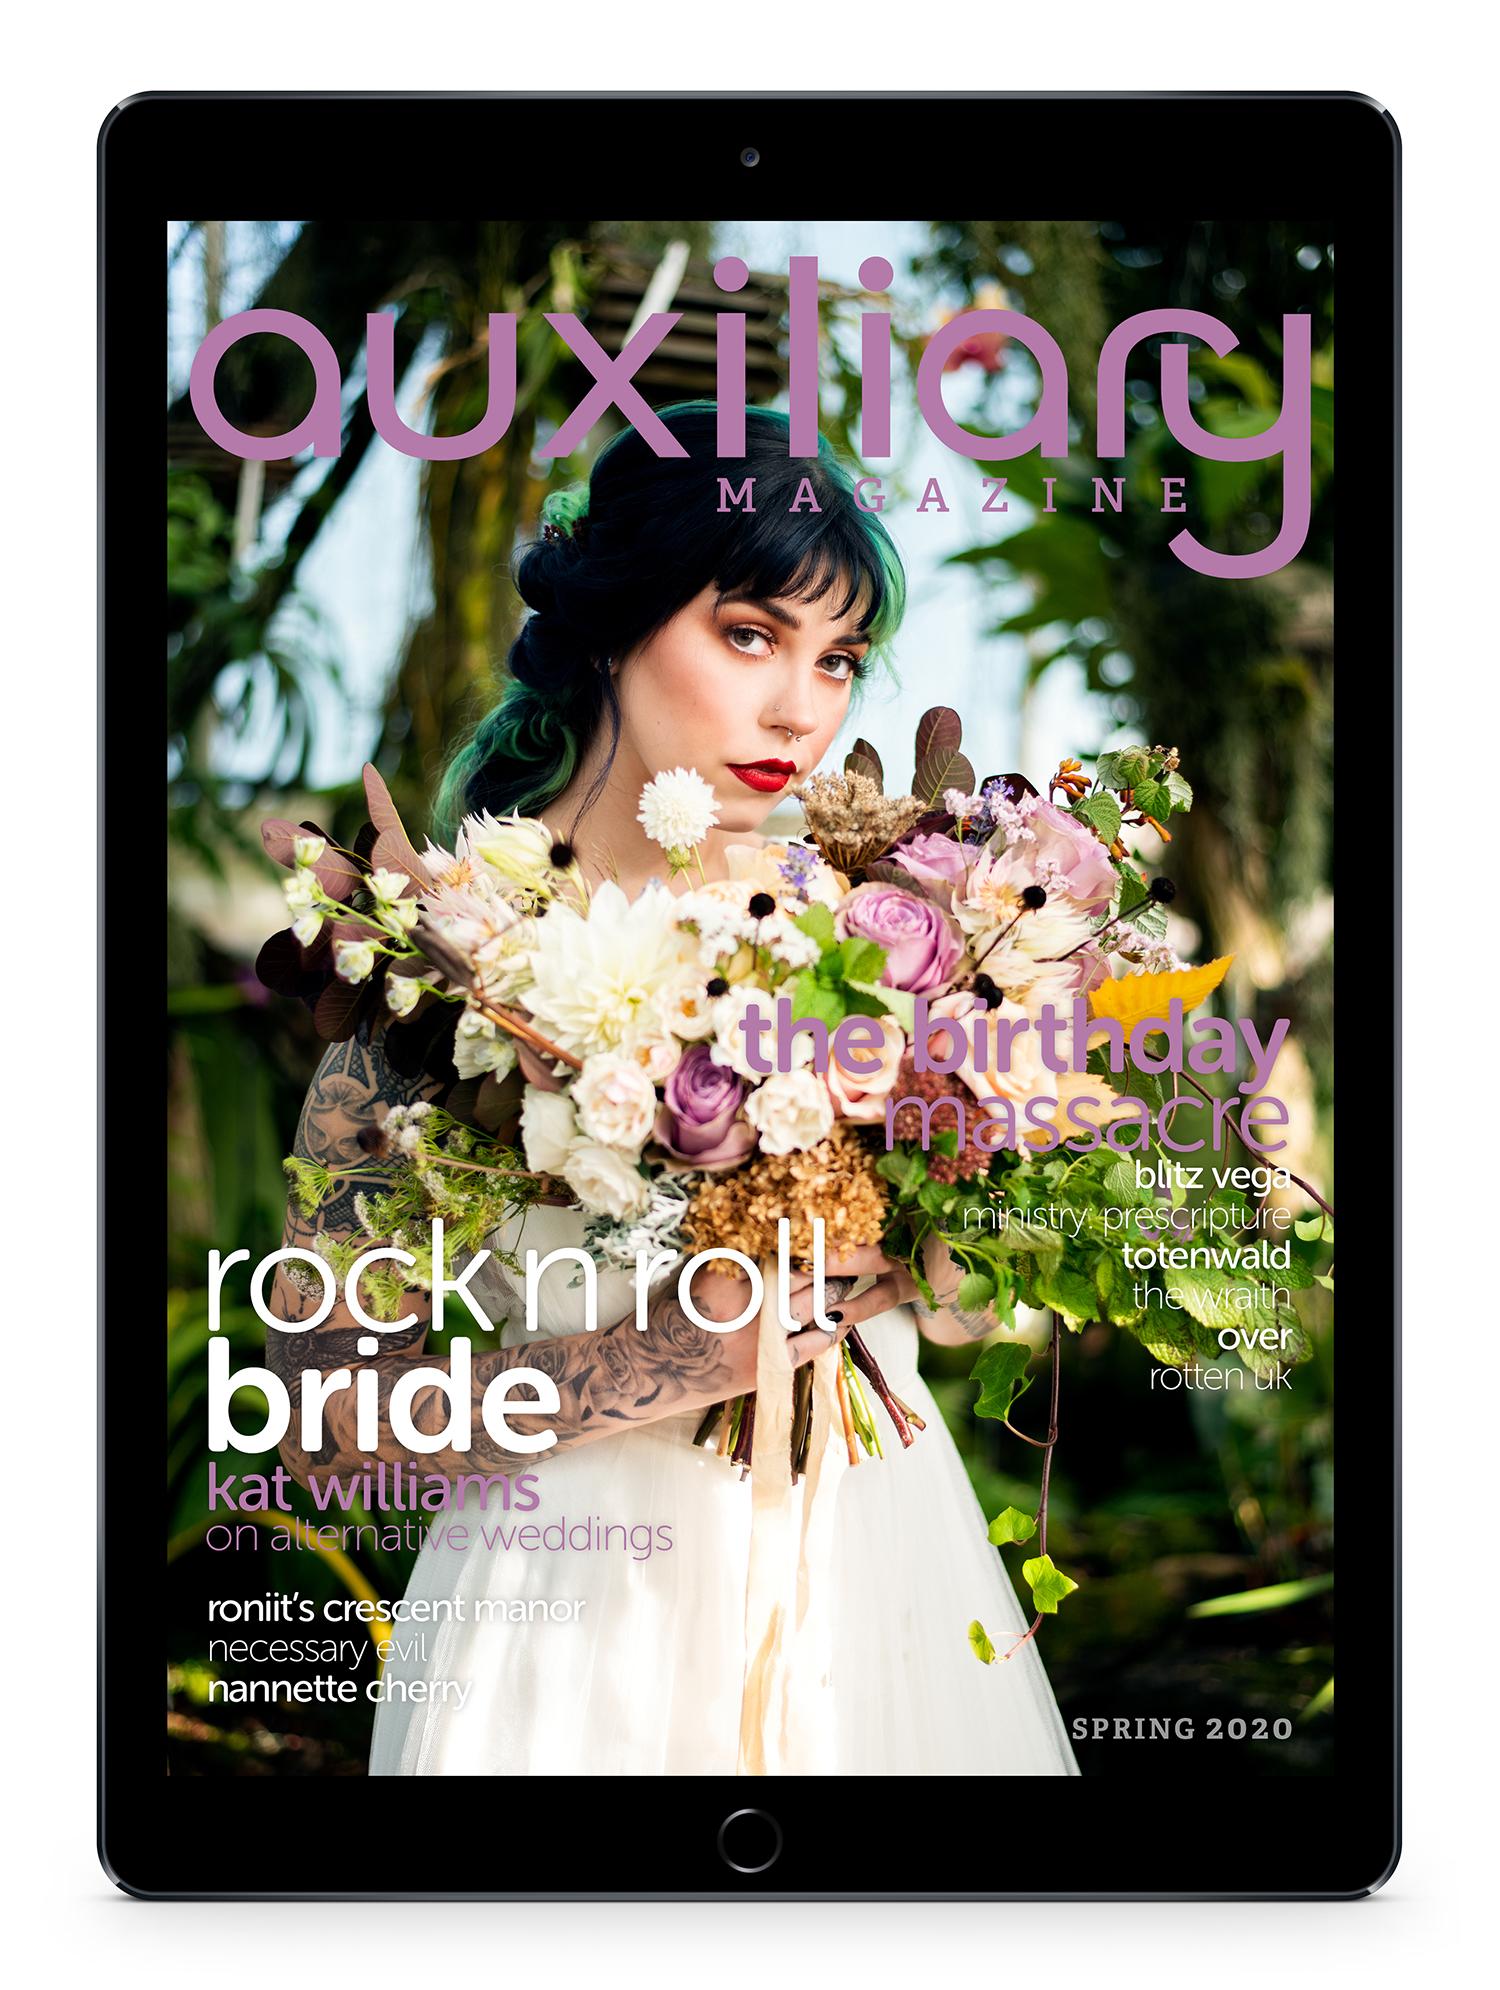 Auxiliary Magazine Spring 2020 Digital Edition